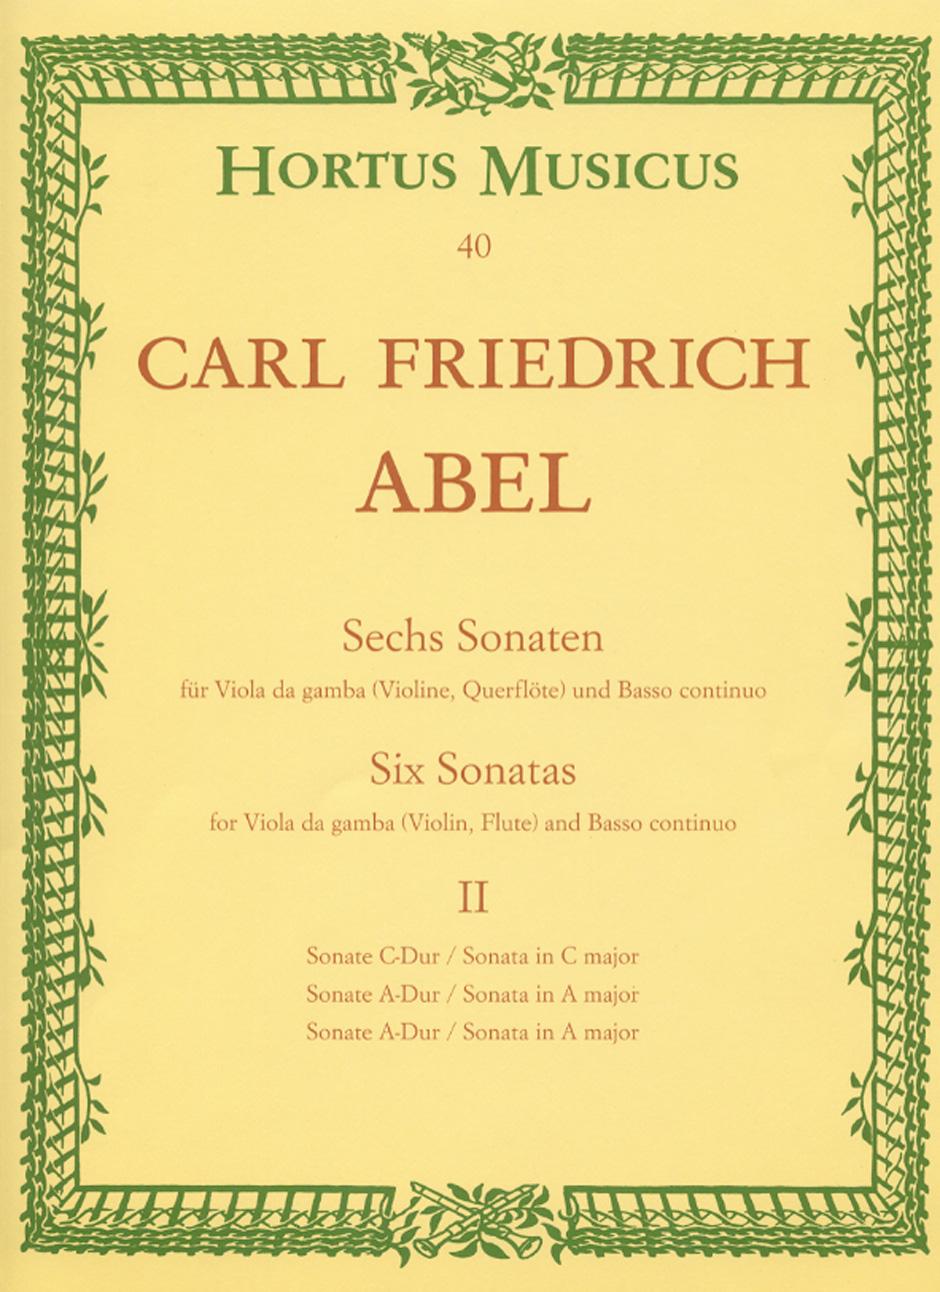 Carl Friedrich Abel: Sonatas 4-6 Vagb Bc: Chamber Ensemble: Instrumental Work